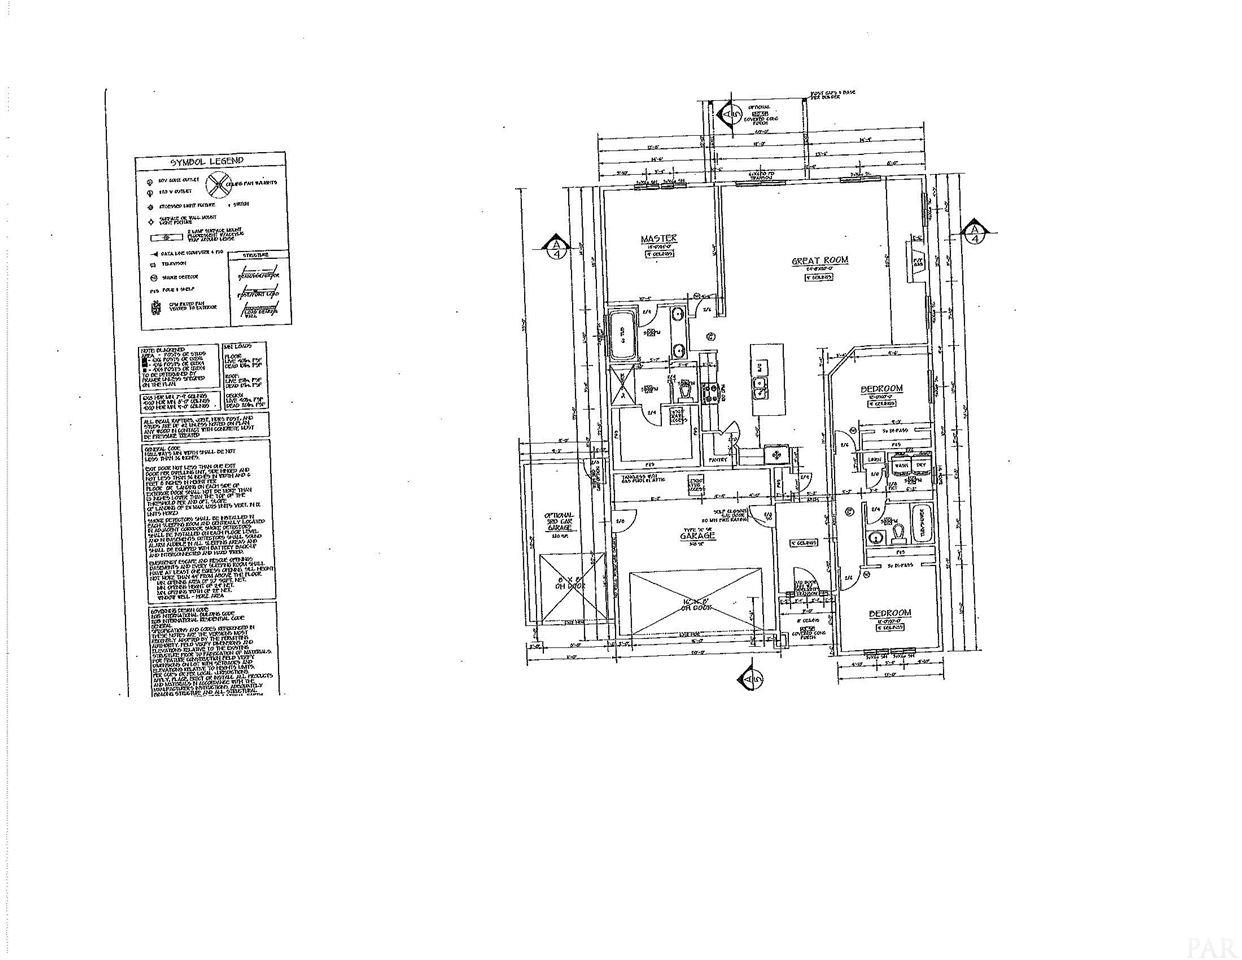 12548 REUNION PLACE PENSACOLA, FL 32506 548300